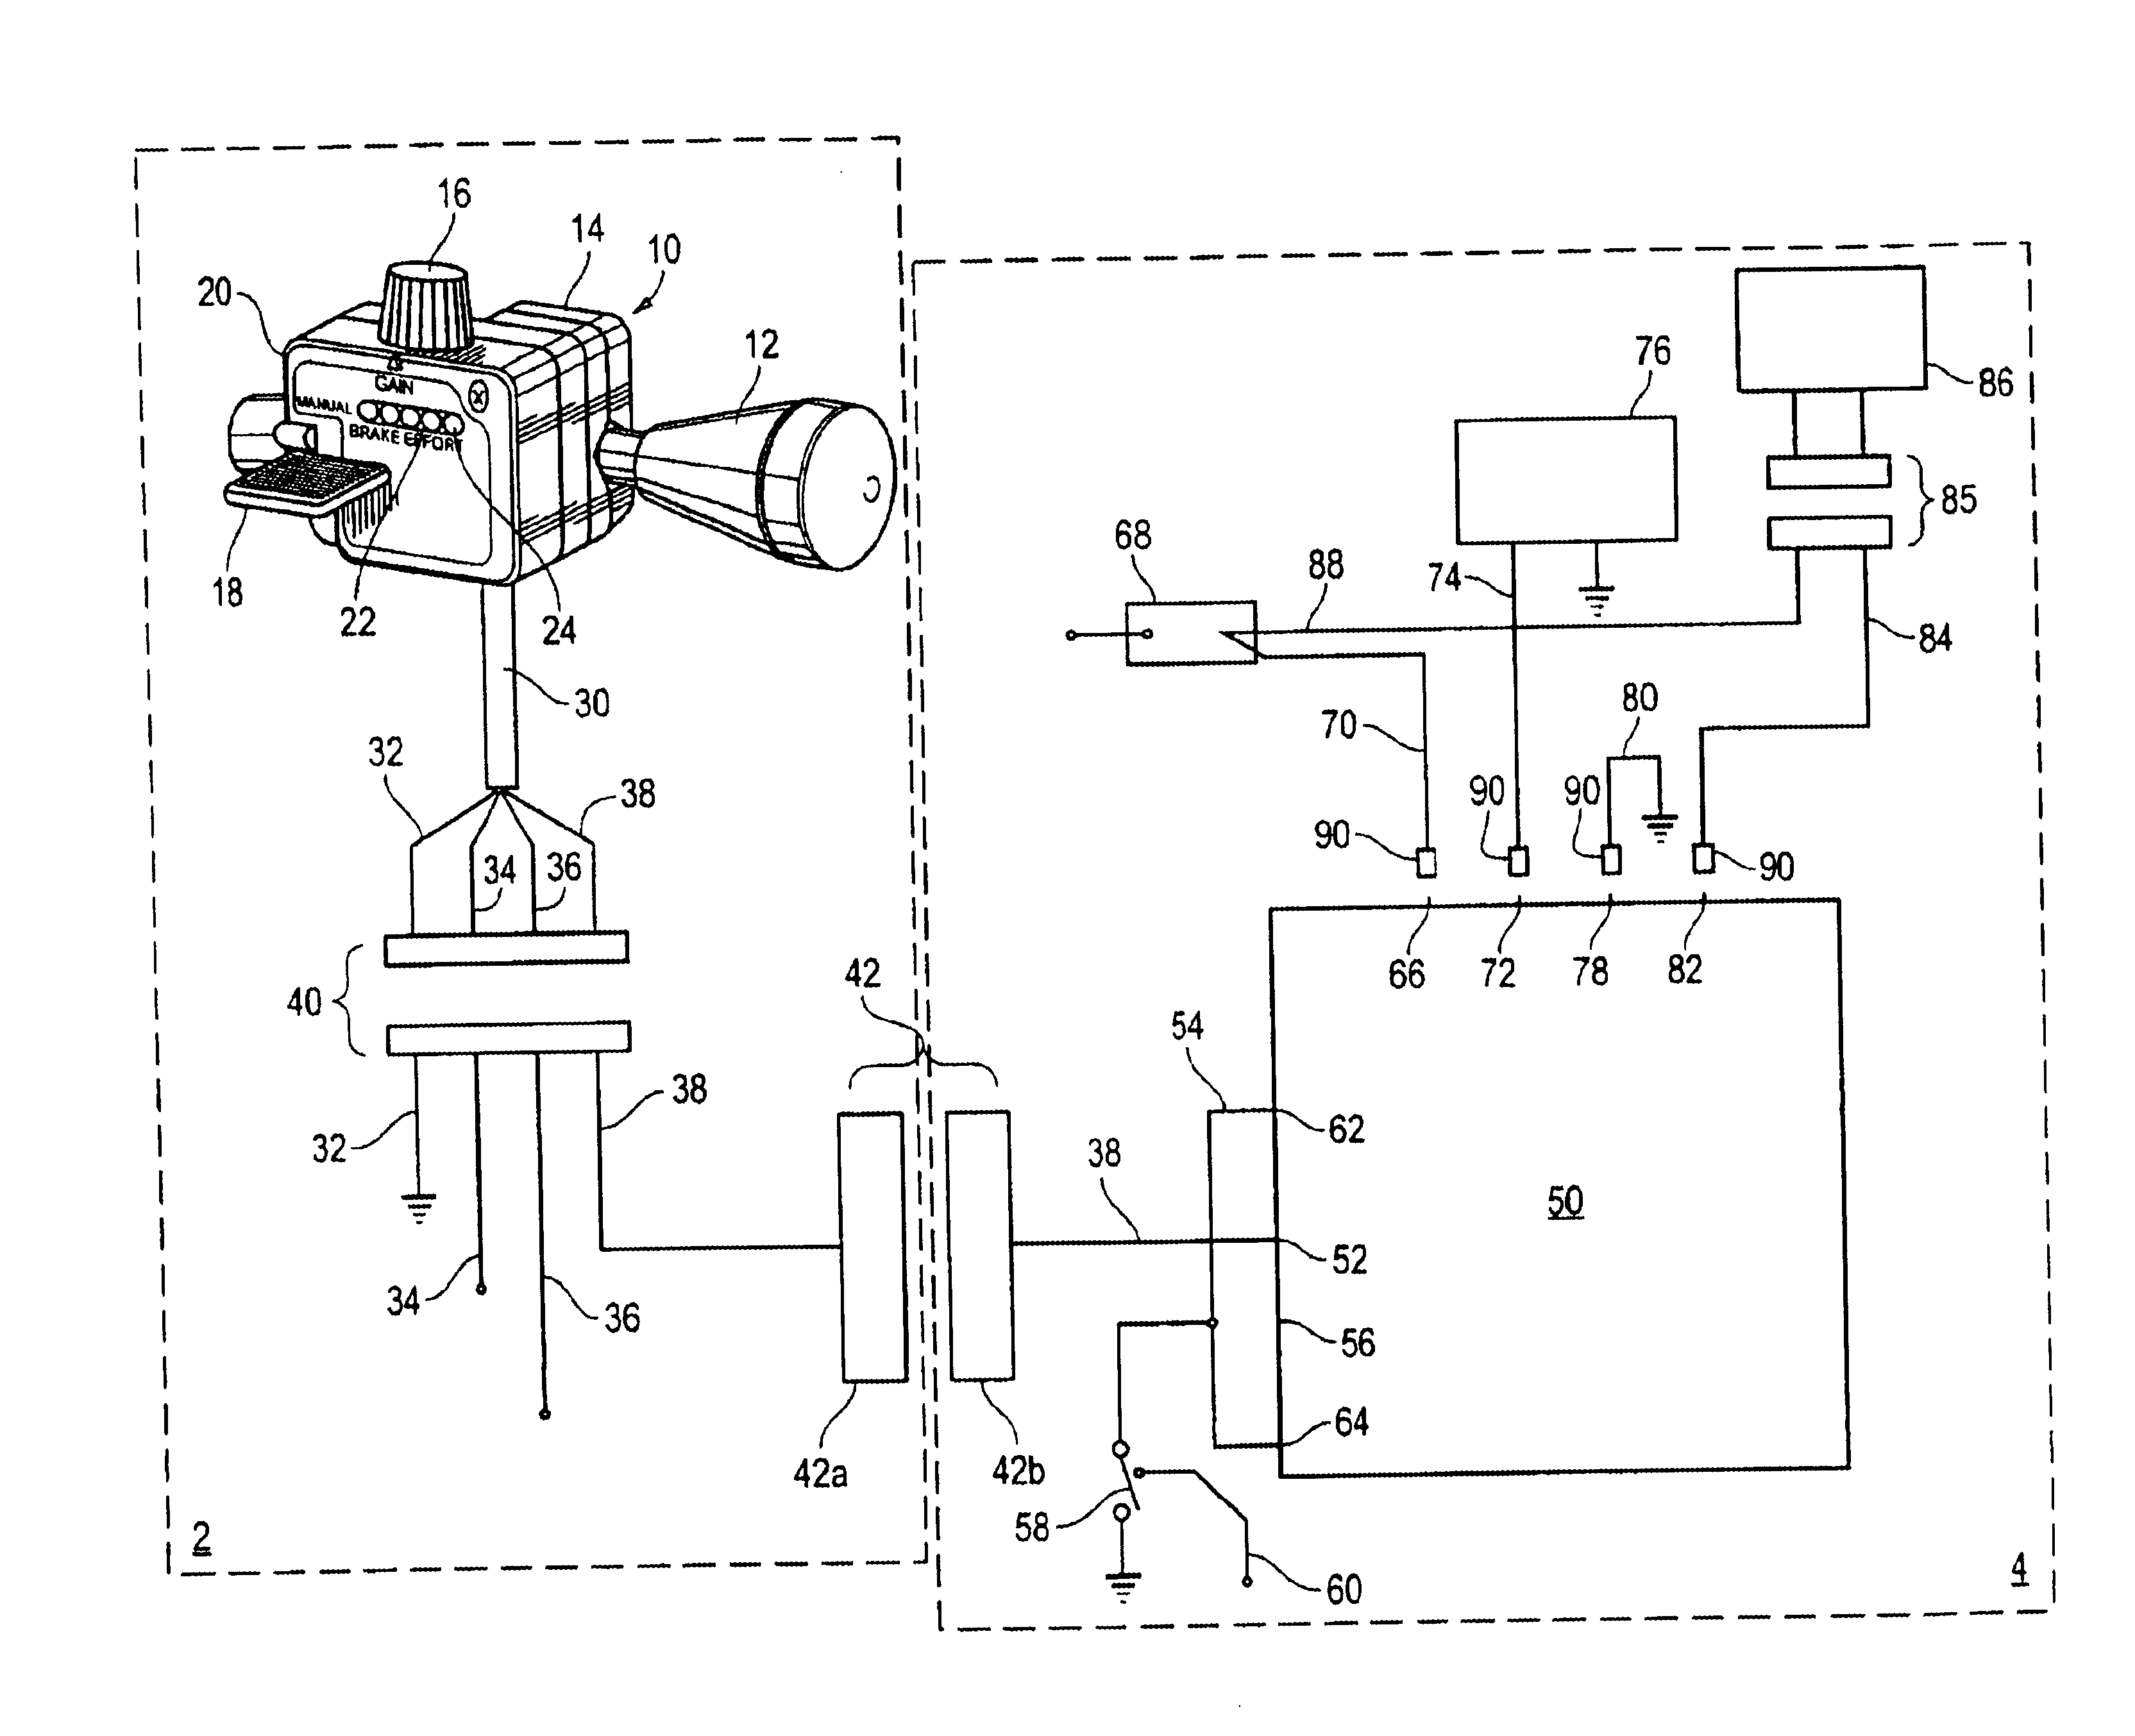 patent us6837551 - towed vehicle brake controller